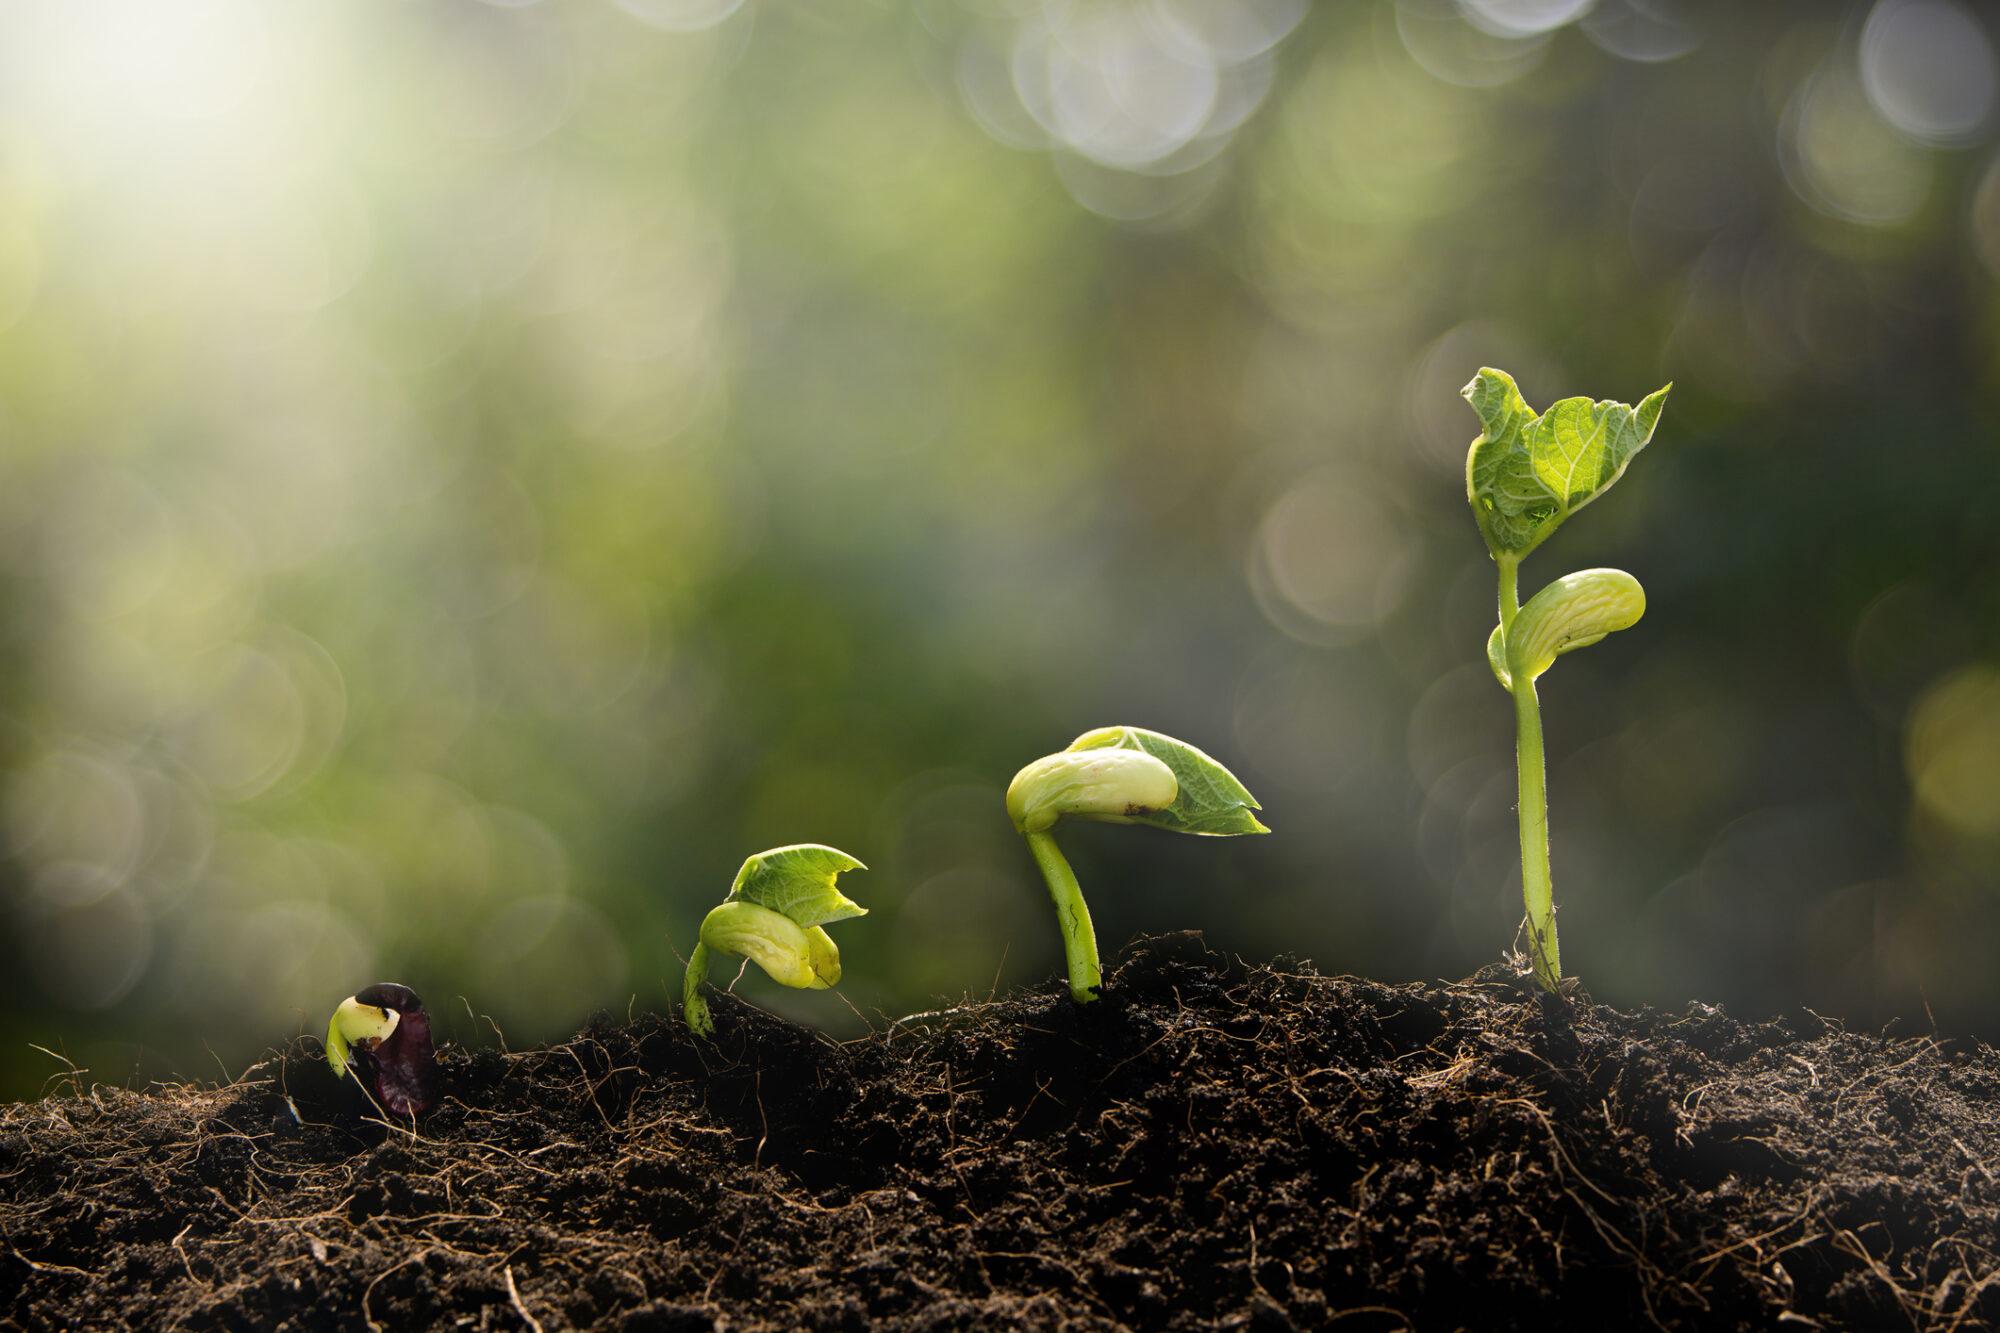 Bosques sostenibles en la imprenta ecológica